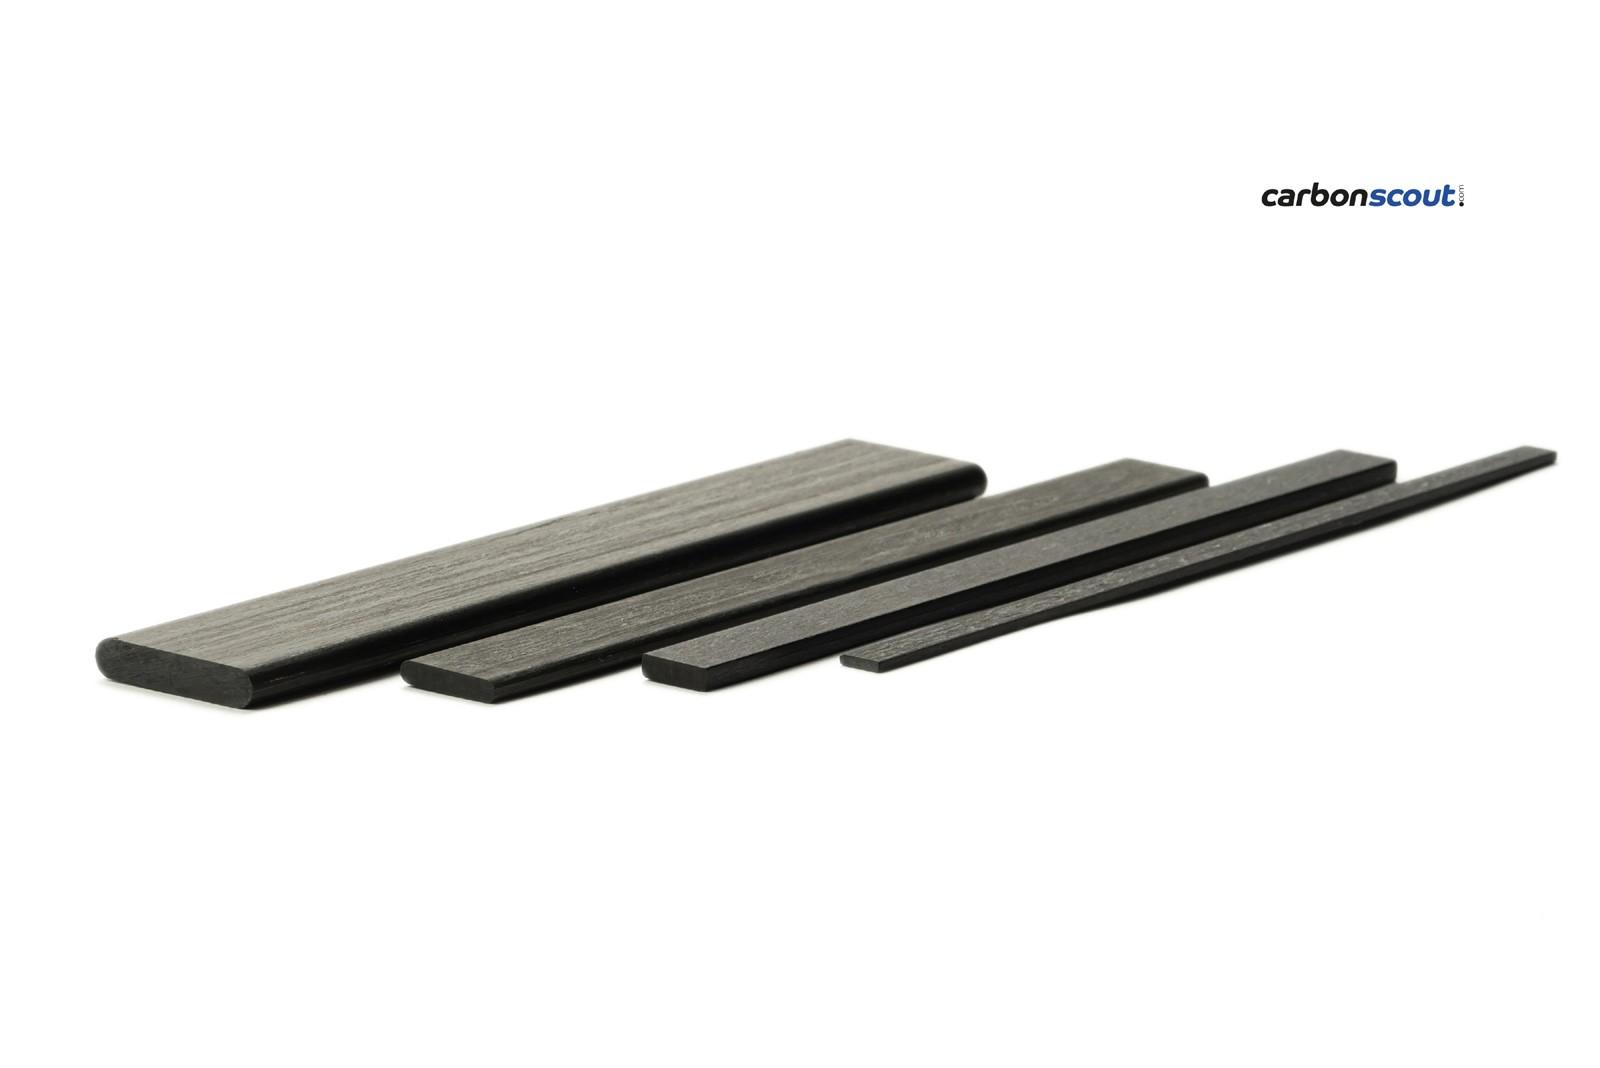 CFRP carbon rectangular profile 6 07 x 1 52 mm, length 1000 mm